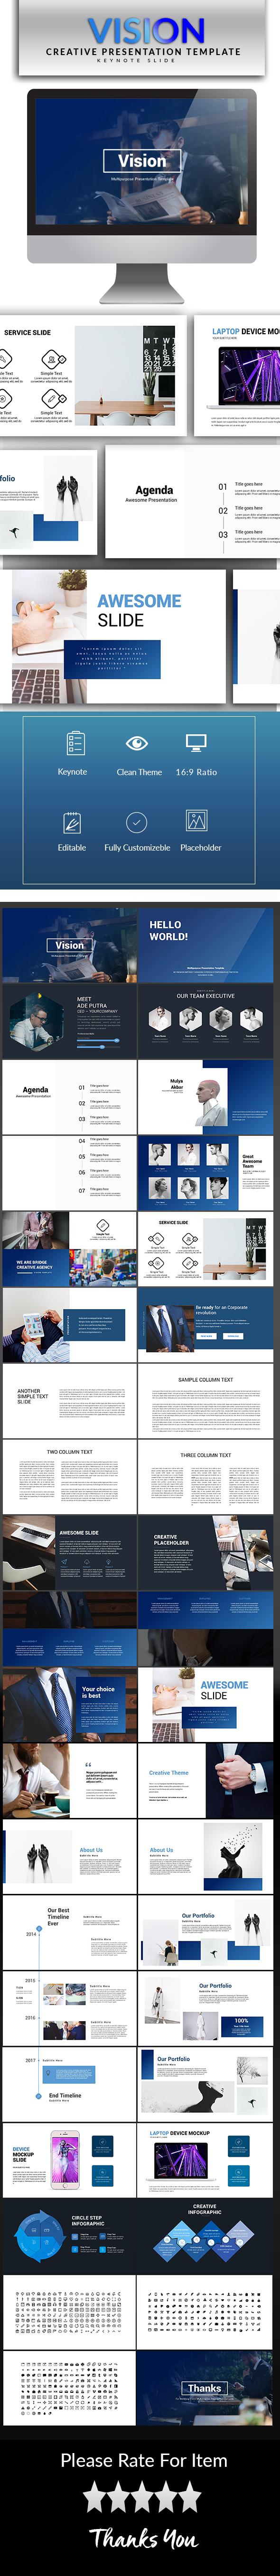 Vision Keynote Template - Keynote Templates Presentation Templates